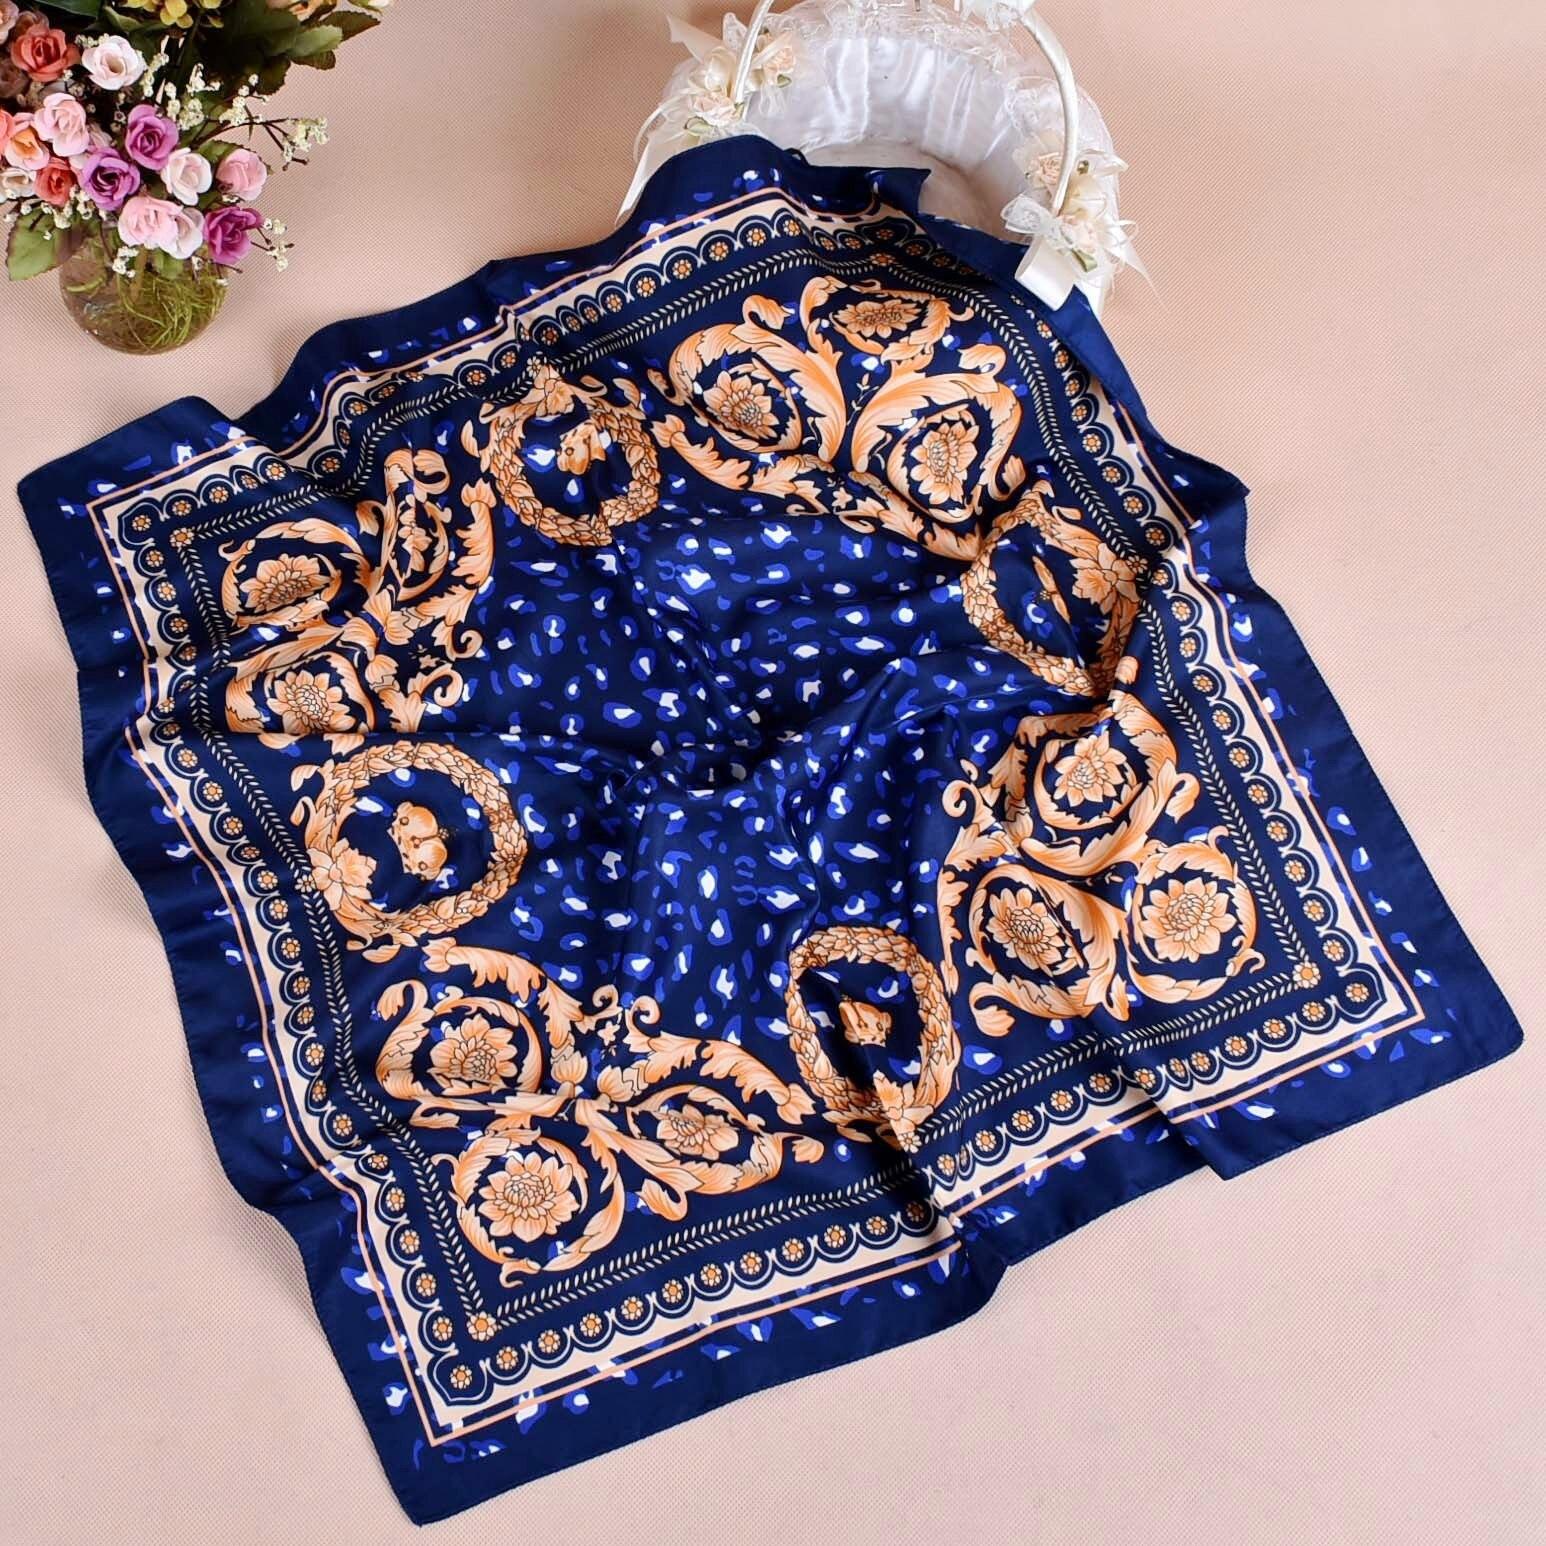 Fashion Women   Scarf   Luxury Brand Striped Dots Print Hijab Pure Silk Shawl Scarfs Foulard Square Head   Scarves     Wraps   2019 NEW